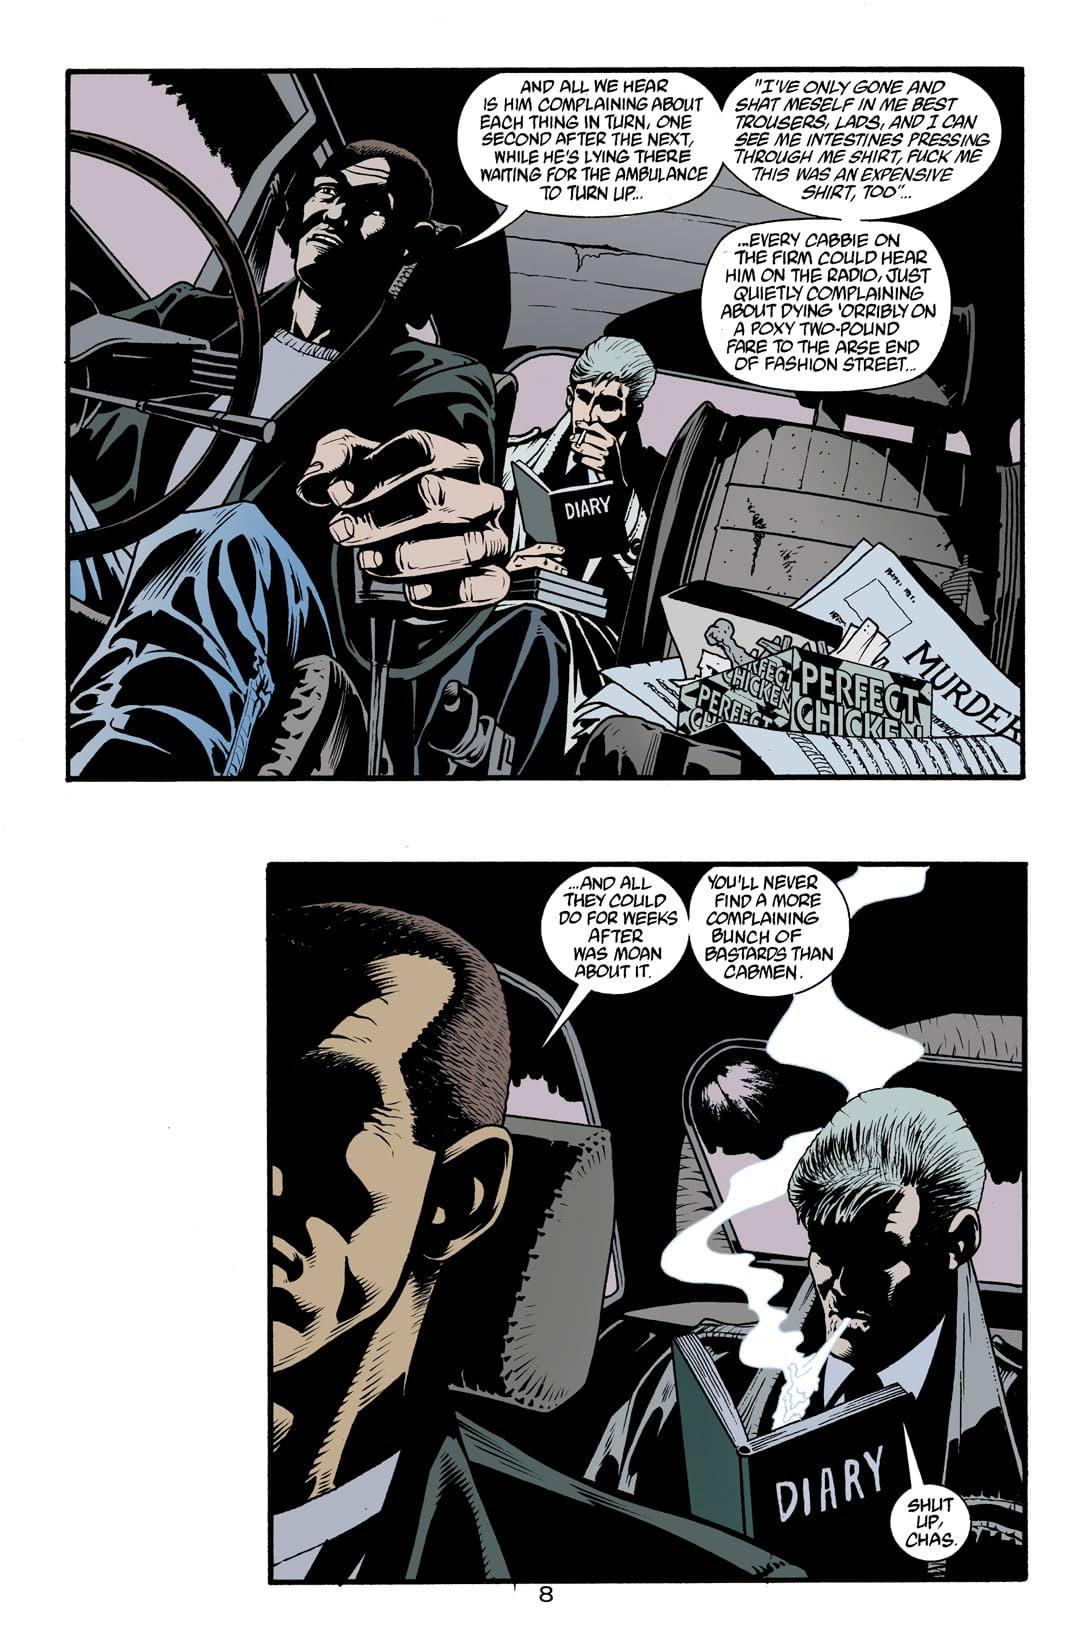 Hellblazer #135